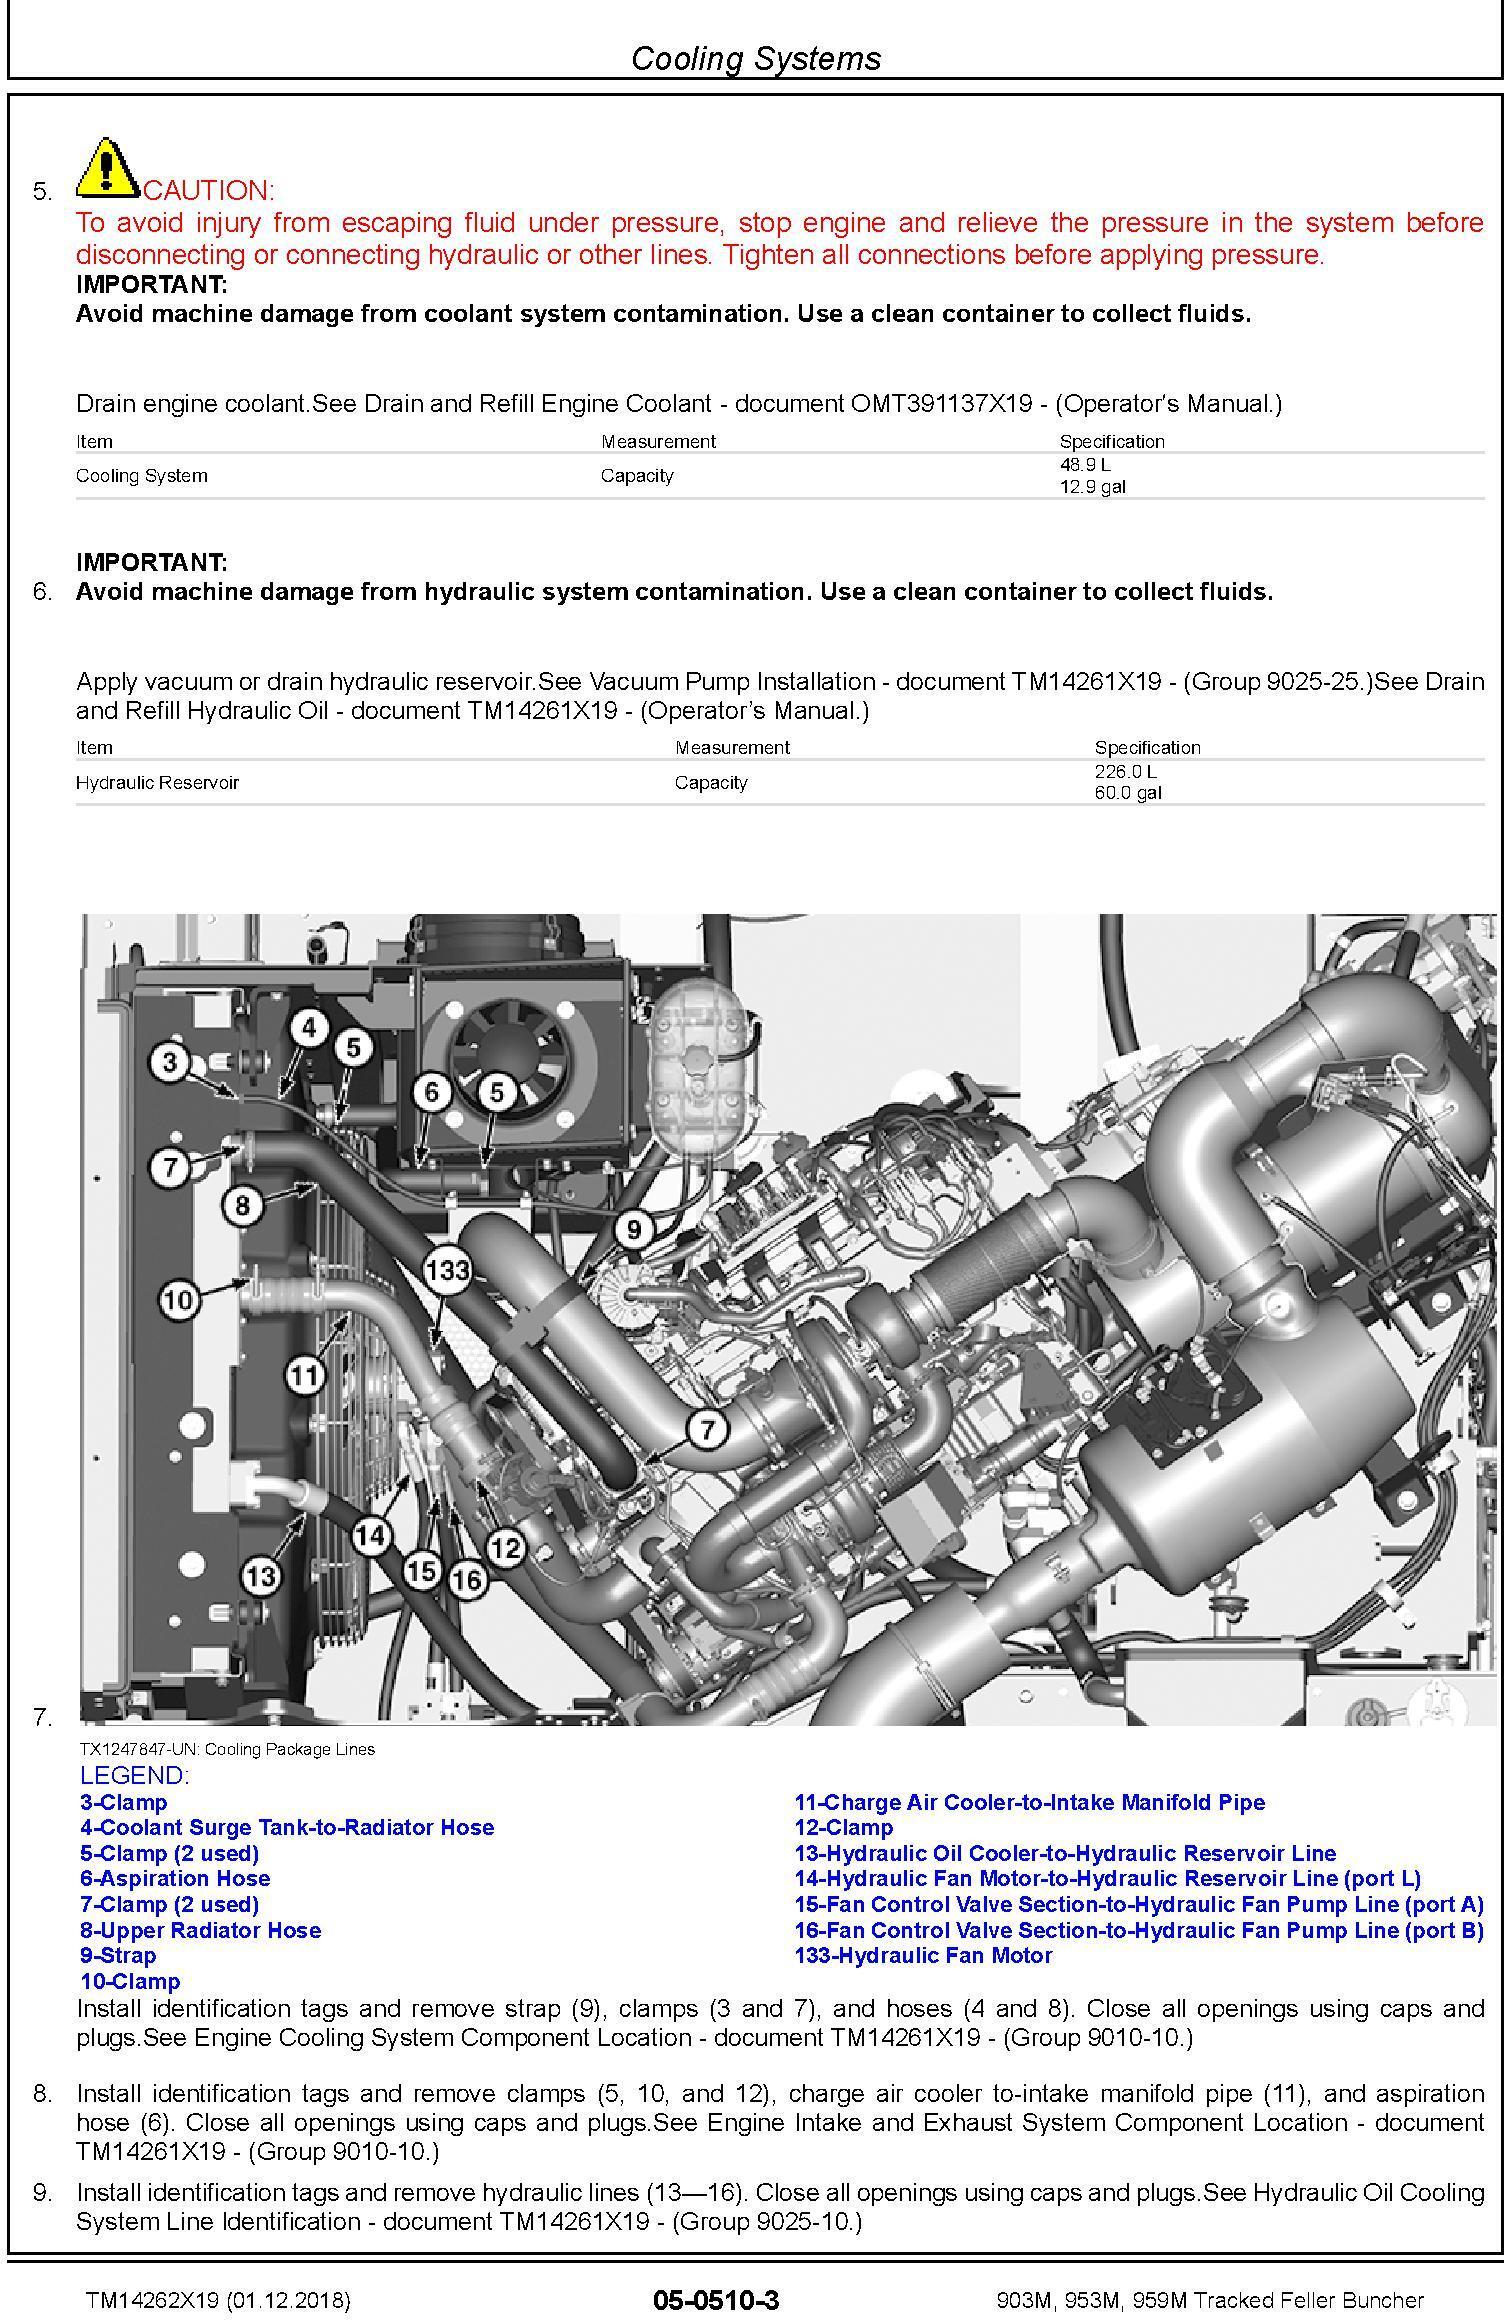 John Deere 903M, 953M, 959M (SN.F317982-,L317982-) Tracked Feller Buncher Repair Manual (TM14262X19) - 3